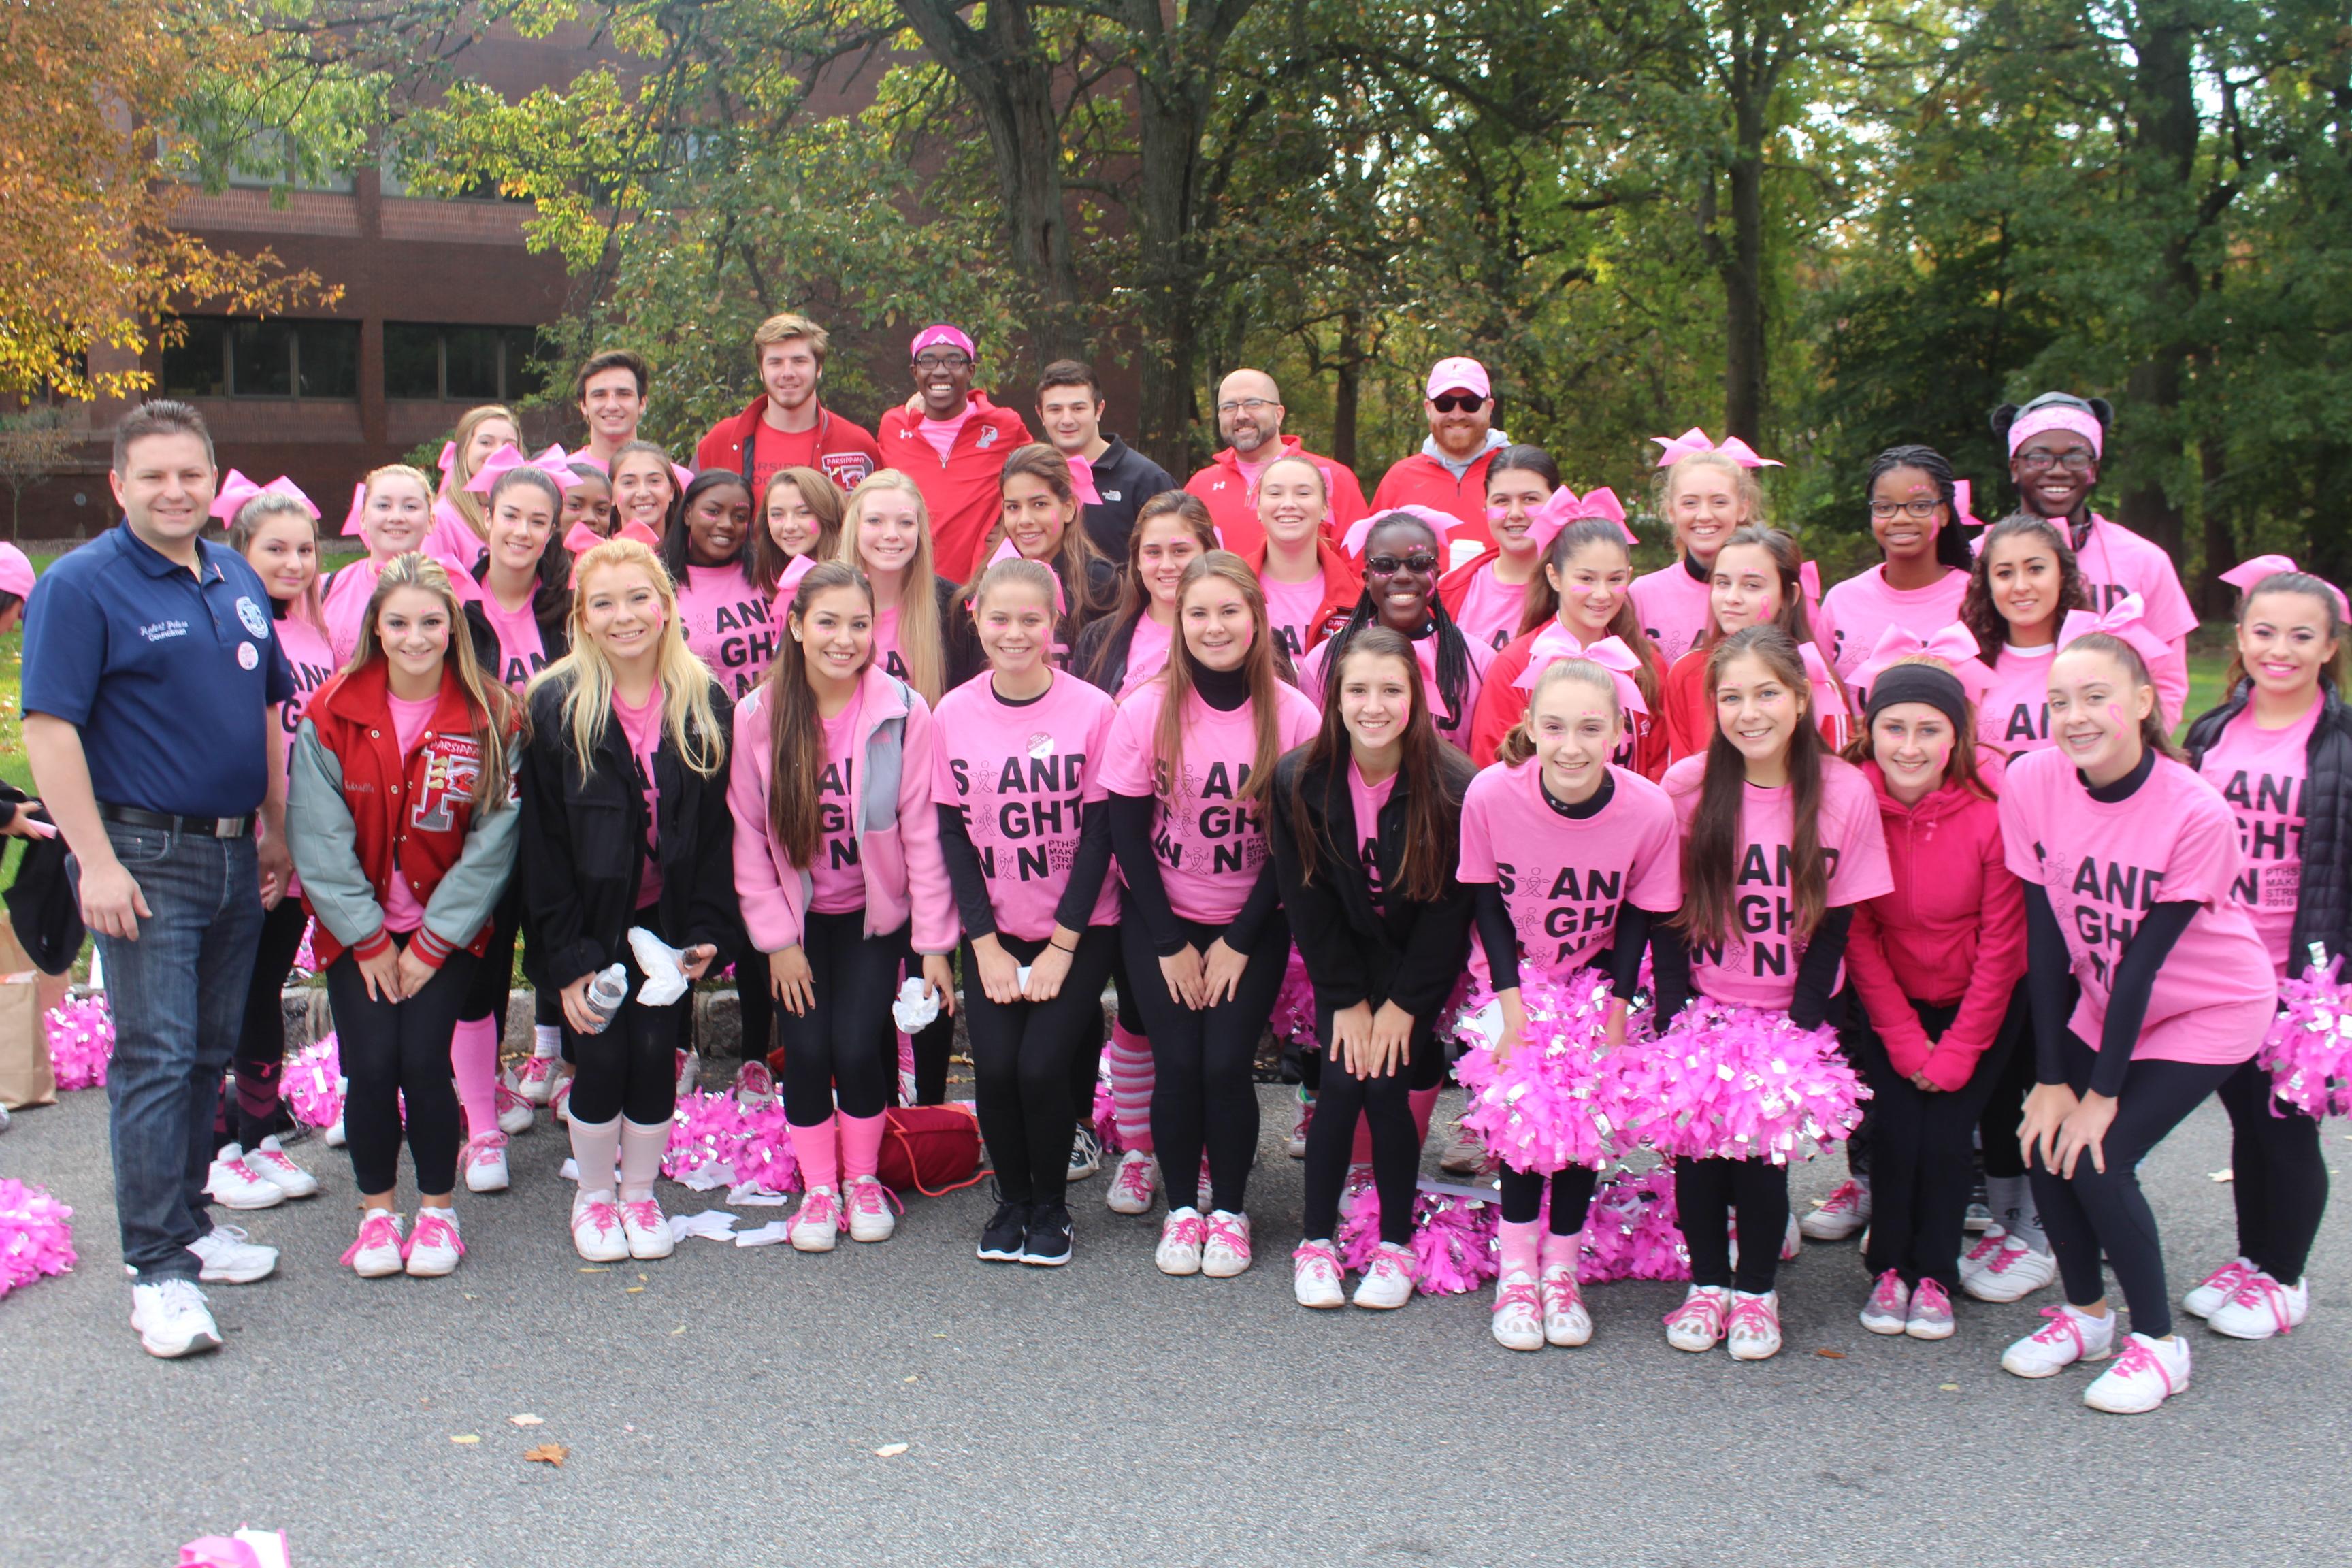 Breast cancer walk in morris county nj